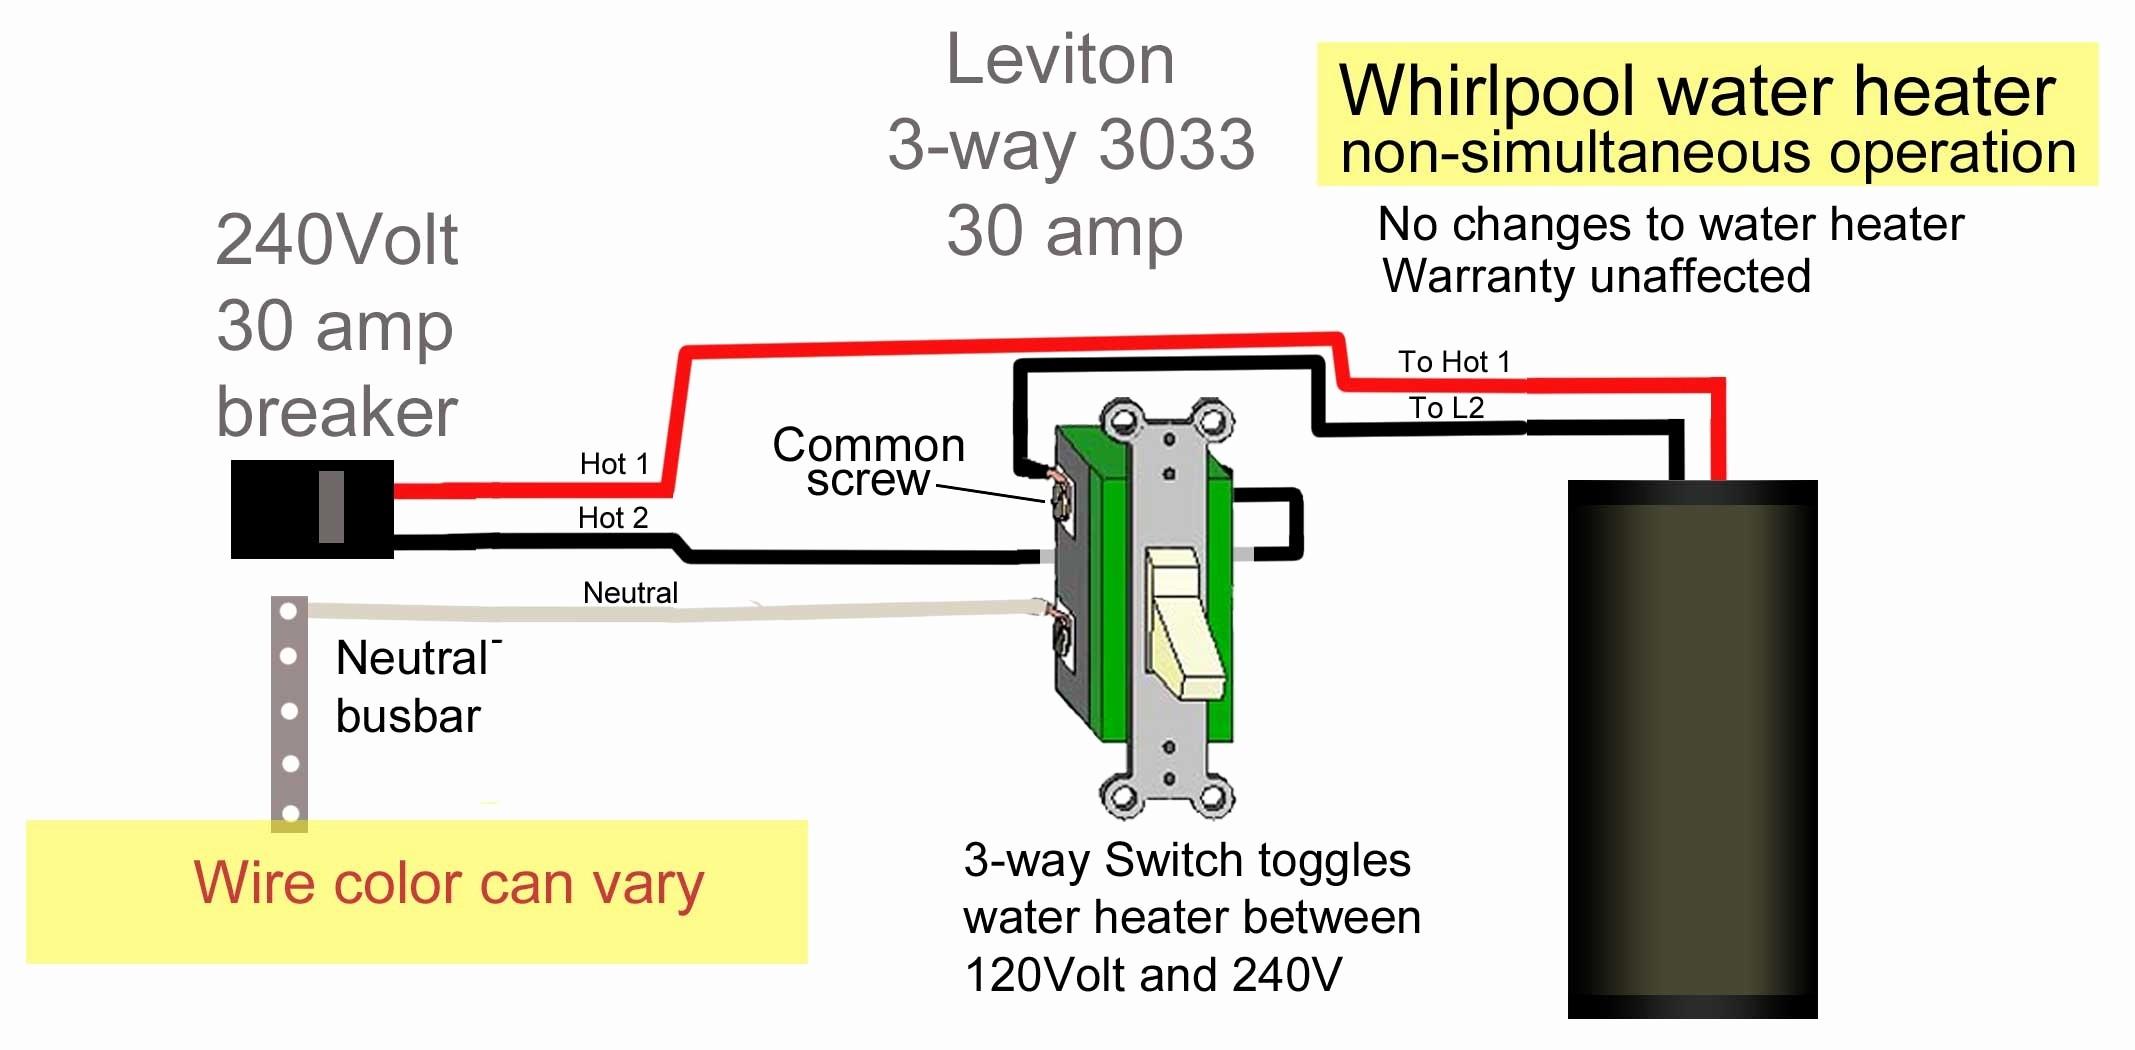 4 wire 220 volt wiring diagram wiring diagram 220v wiring diagram rh detoxicrecenze com 3 Prong 220V Outlet Wiring Diagram 220V Outlet Wiring Diagram